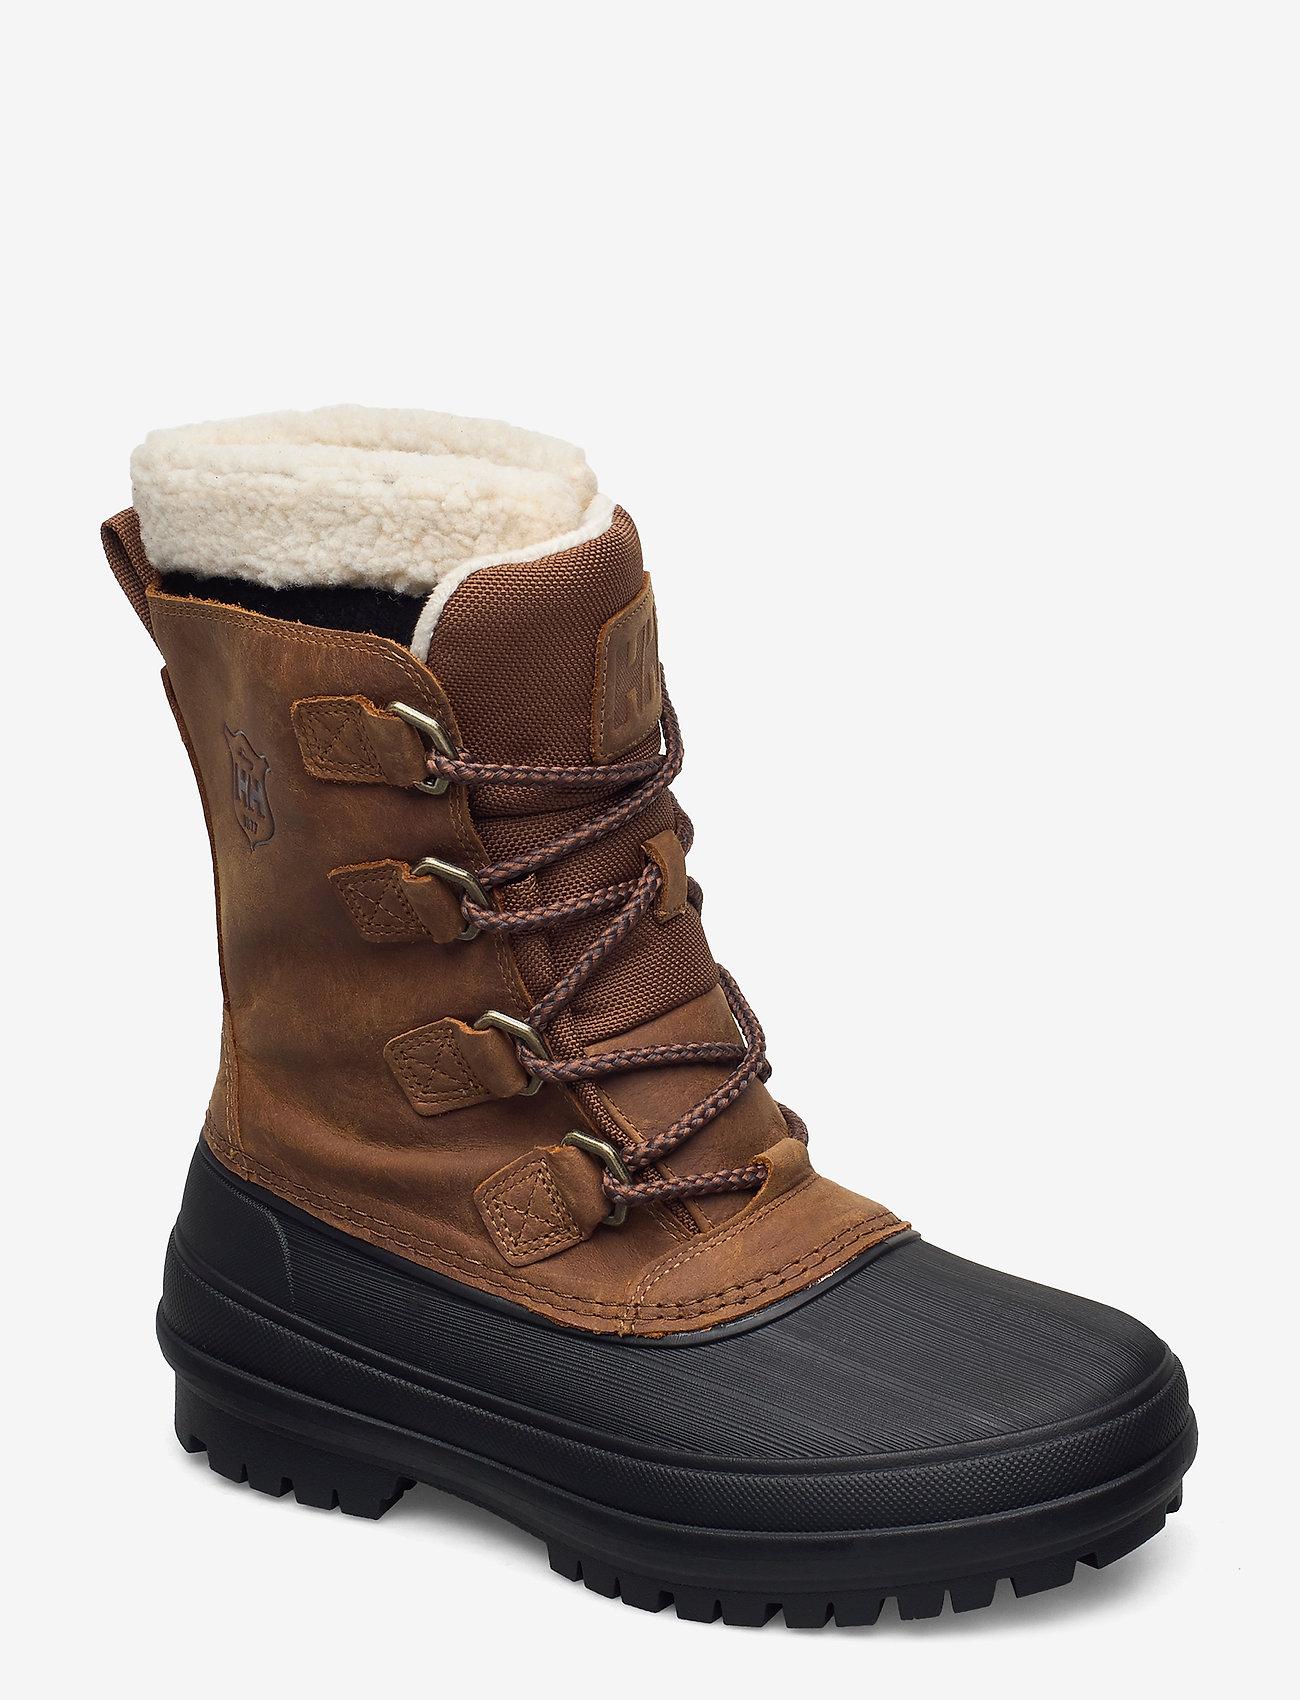 Helly Hansen - W VARANGER PRIMALOFT - flat ankle boots - 741 bistre / black - 0